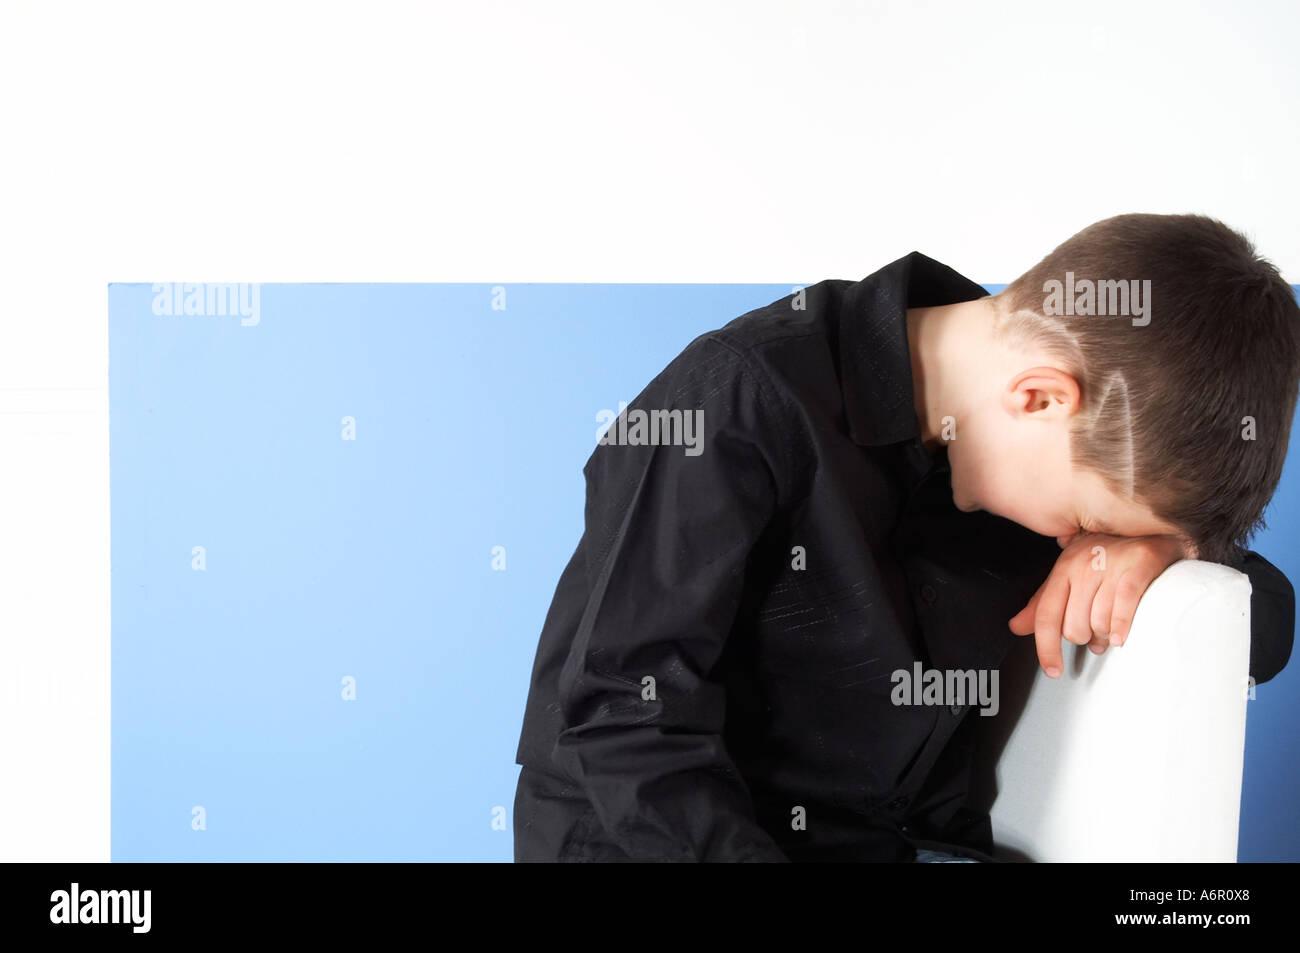 Sulking sulk cry crying tears sad saddness childhood unhappy mood moody child boy kid